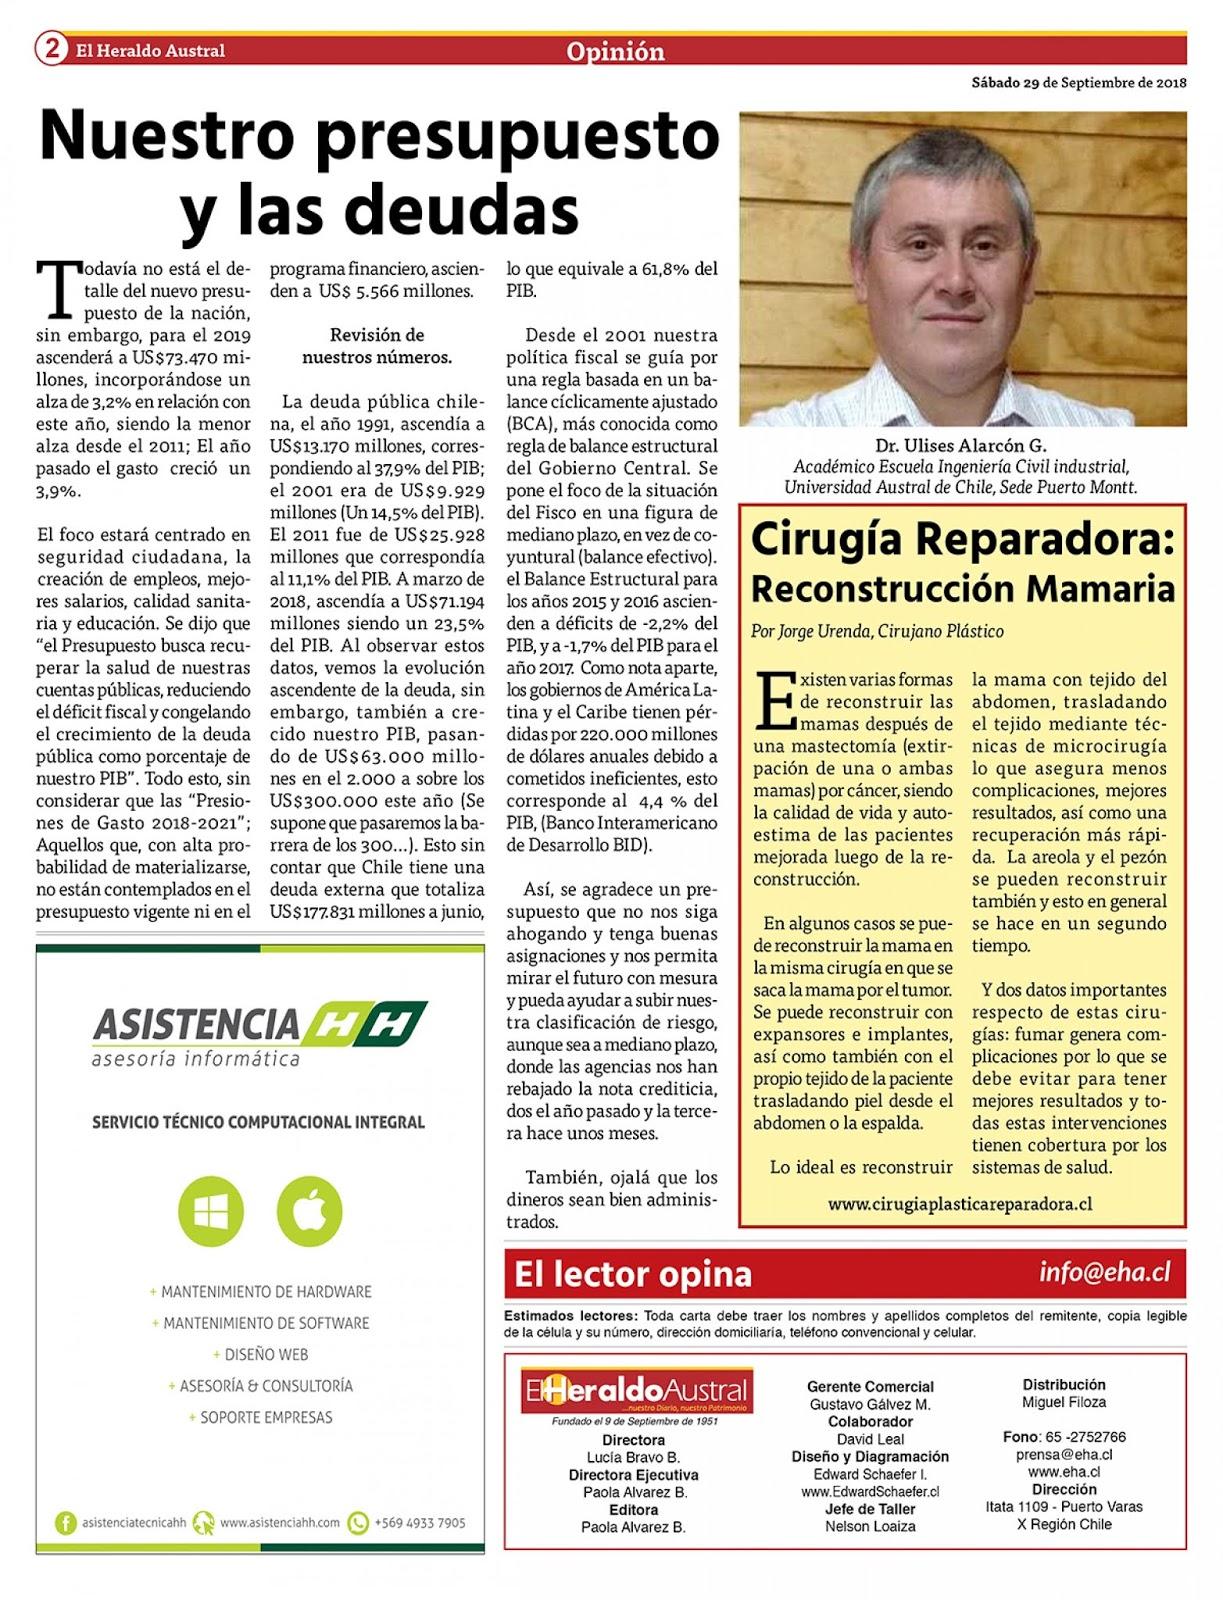 Gestion Empresarial Dr Ph D Ulises Alarcon G